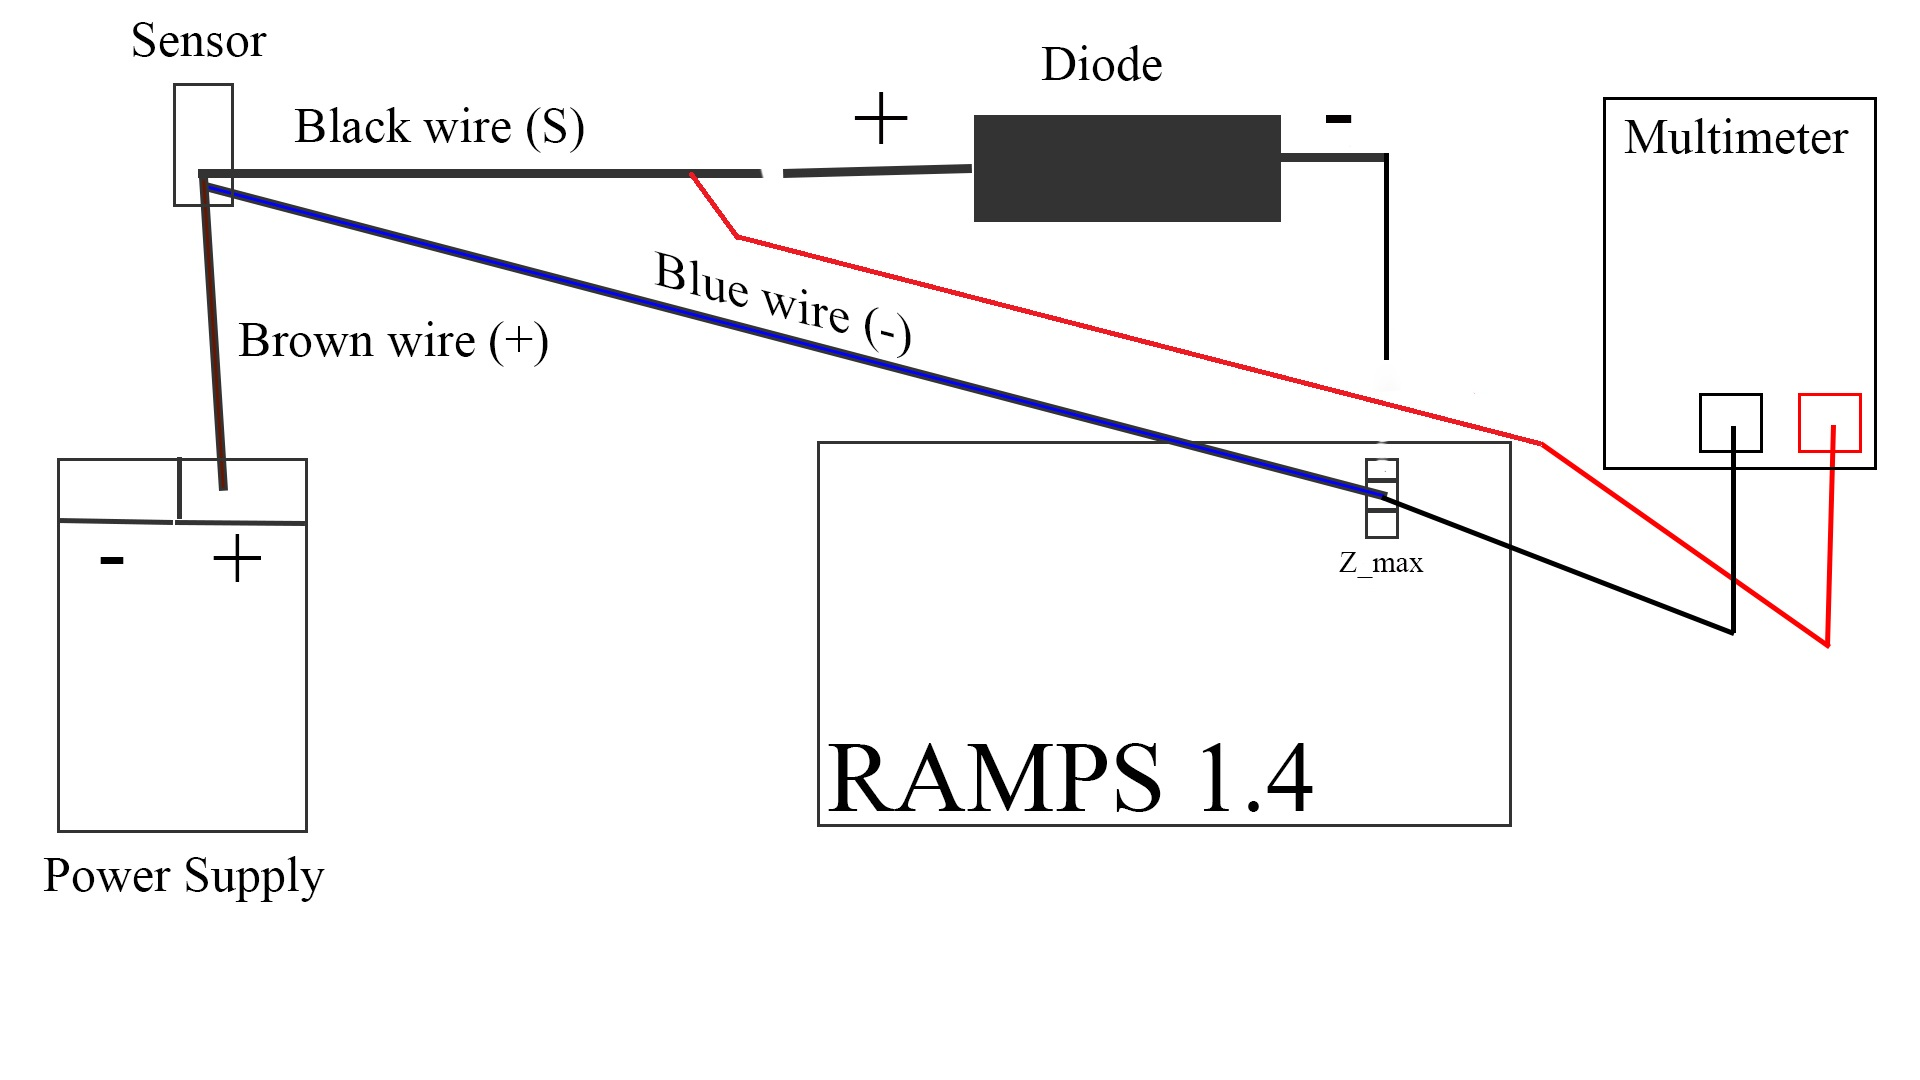 sensor lj18a3-8-z bx npn no